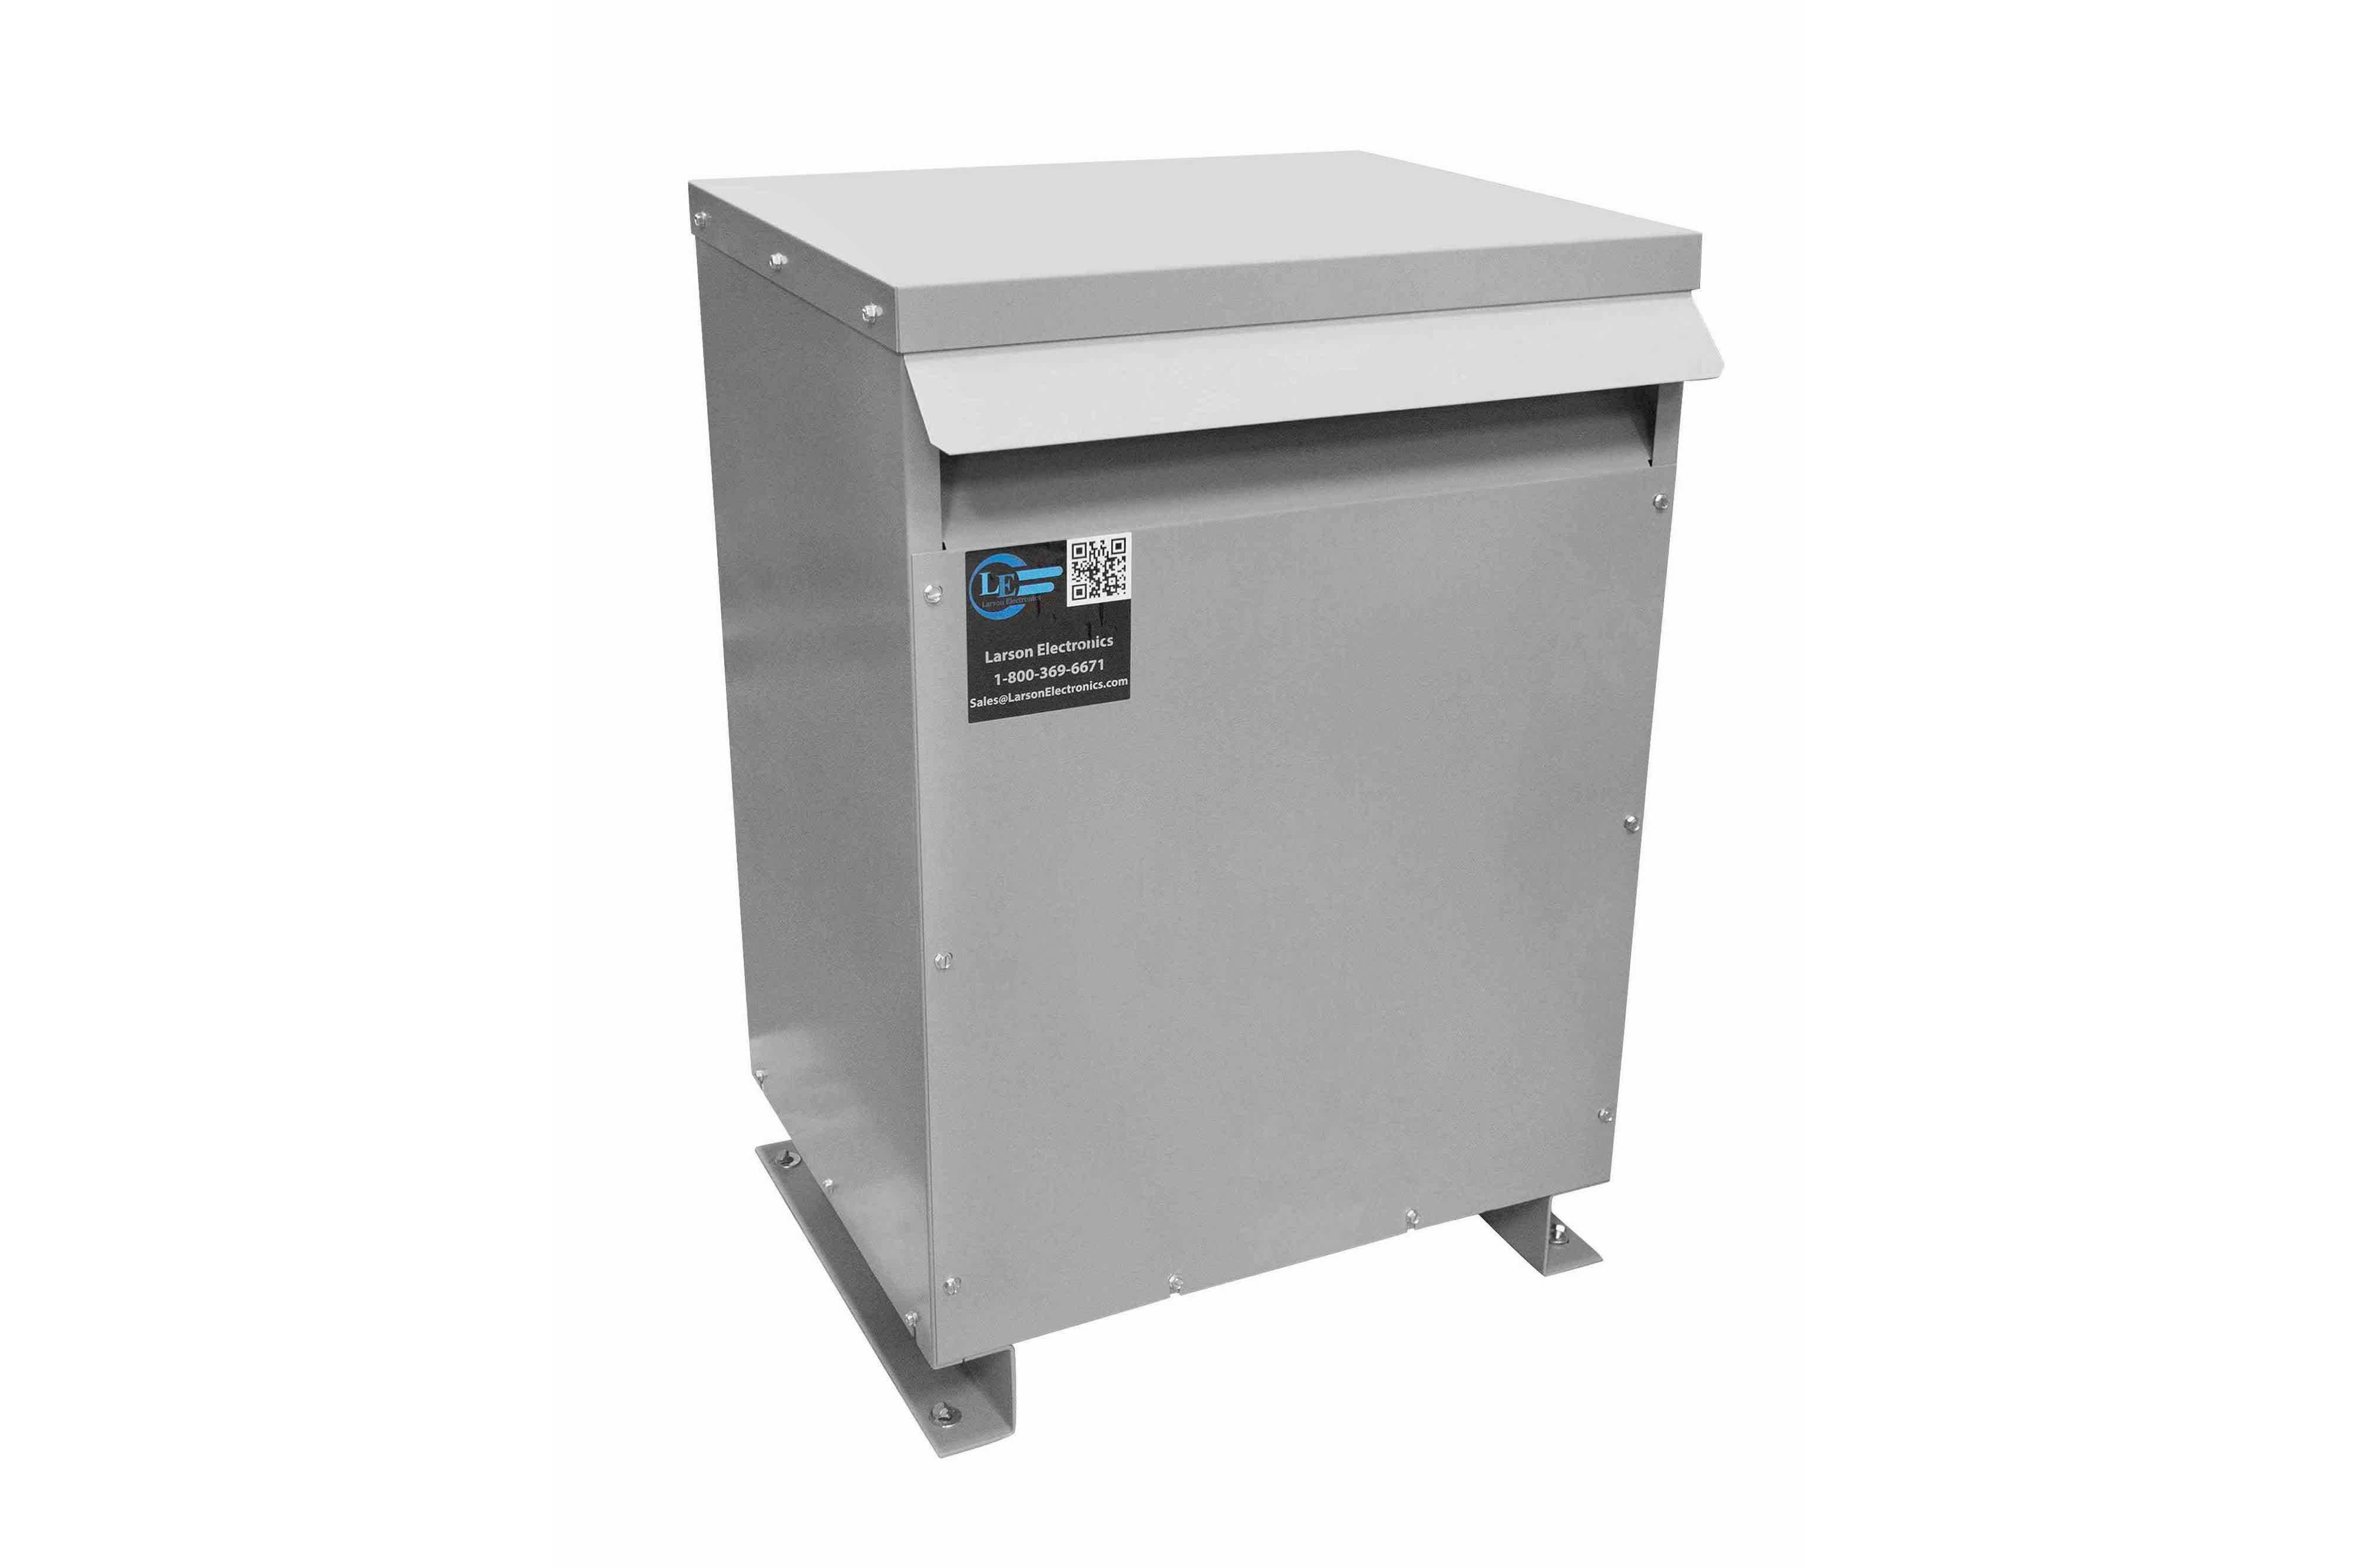 400 kVA 3PH DOE Transformer, 400V Delta Primary, 480Y/277 Wye-N Secondary, N3R, Ventilated, 60 Hz